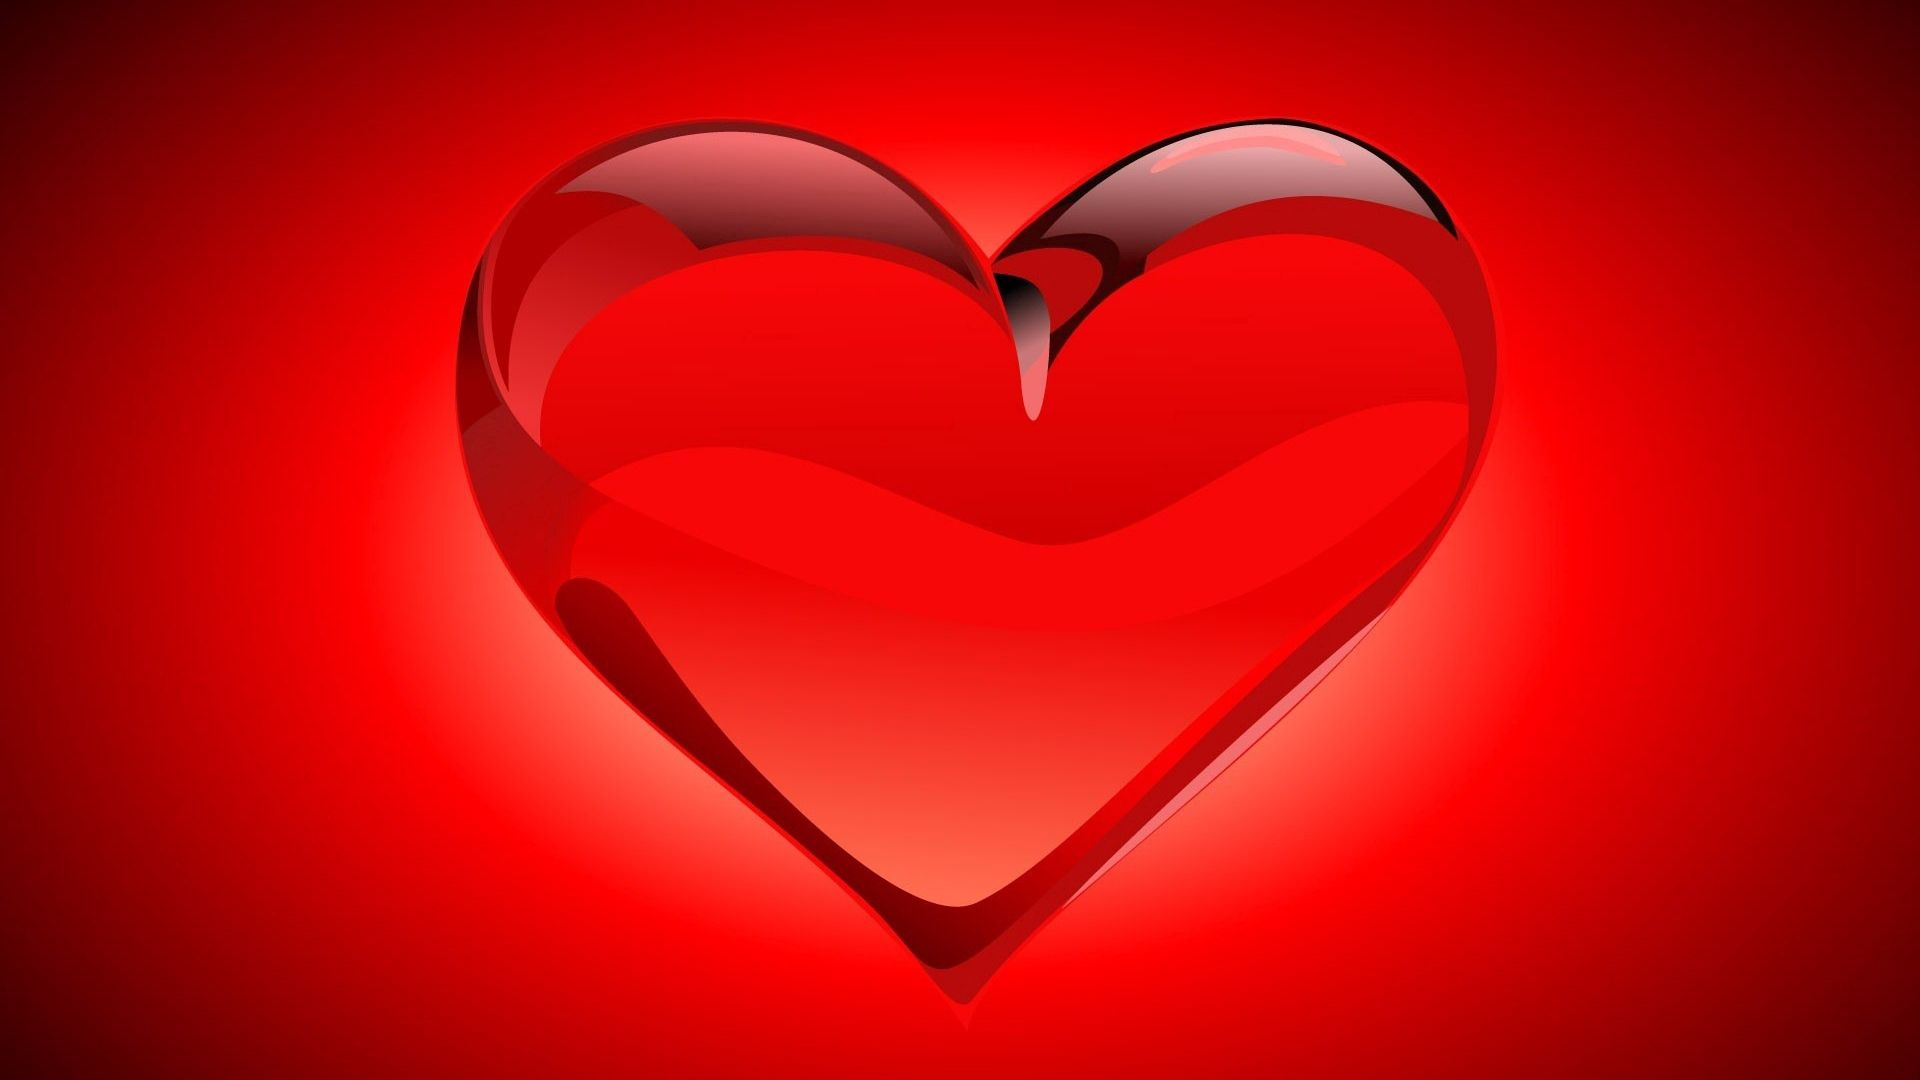 Image Of Love free image